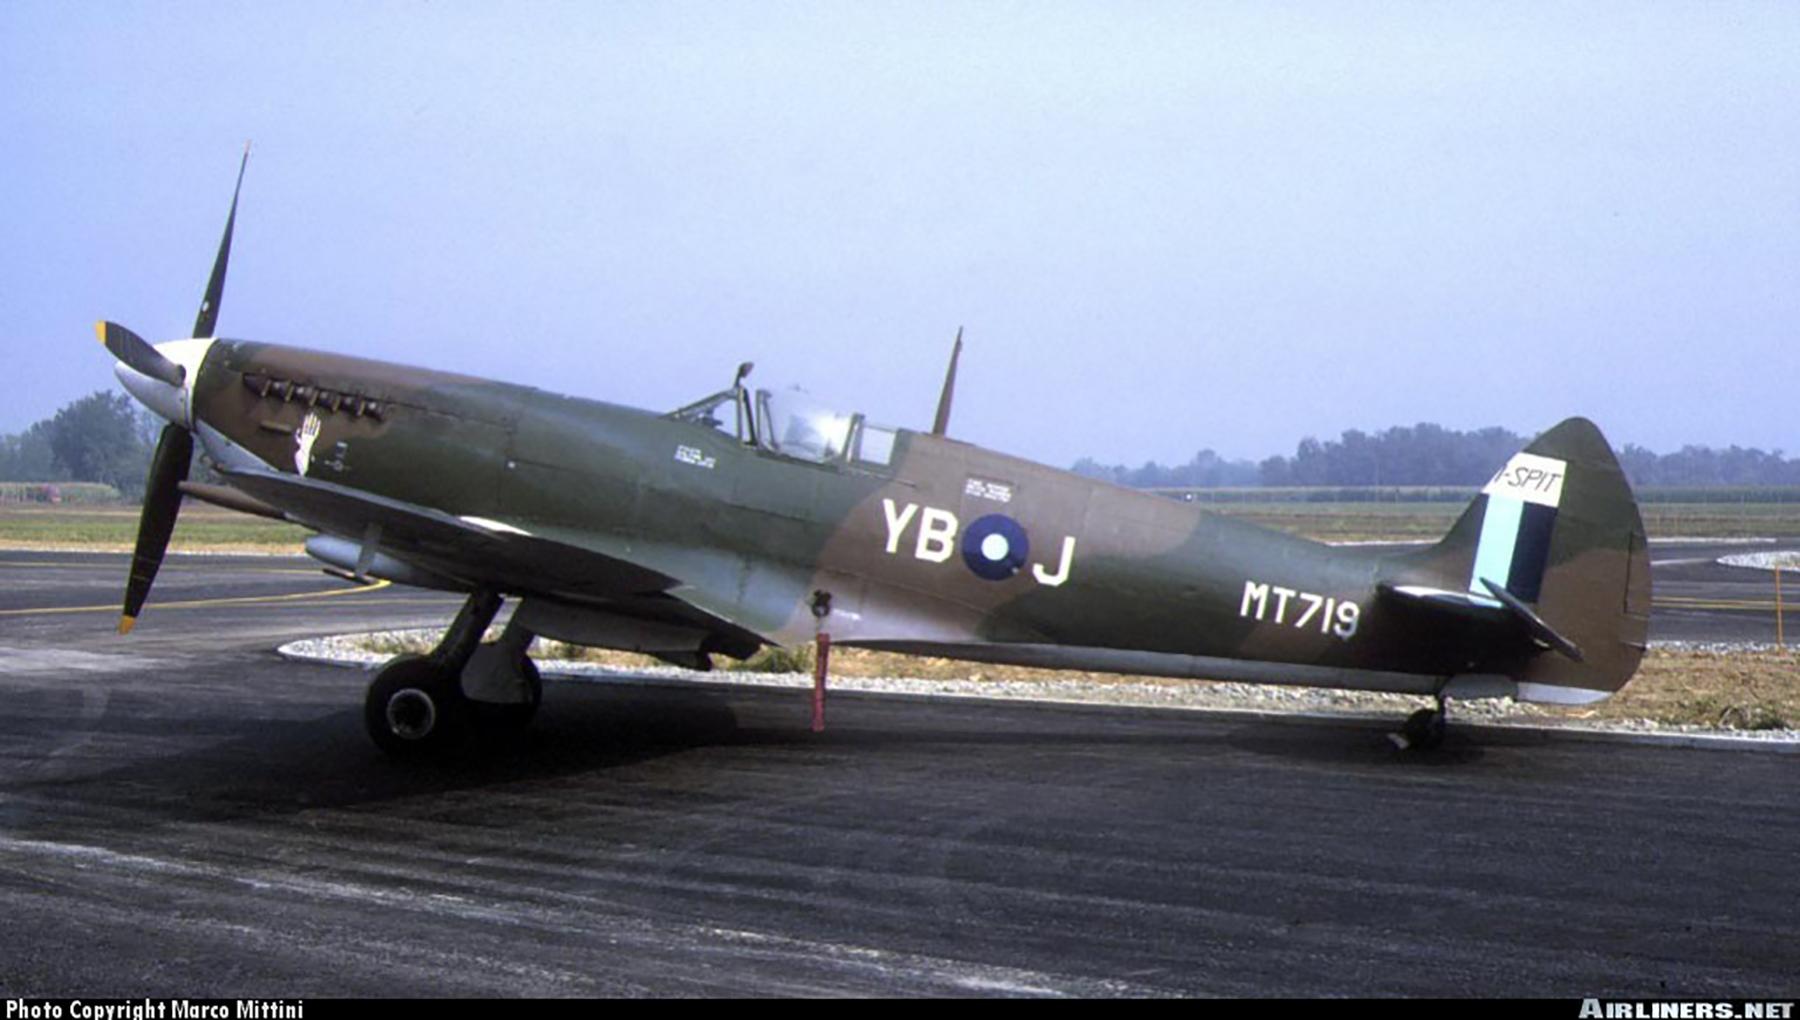 Airworthy Spitfire warbird RAF 17Sqn YBA MT719 01